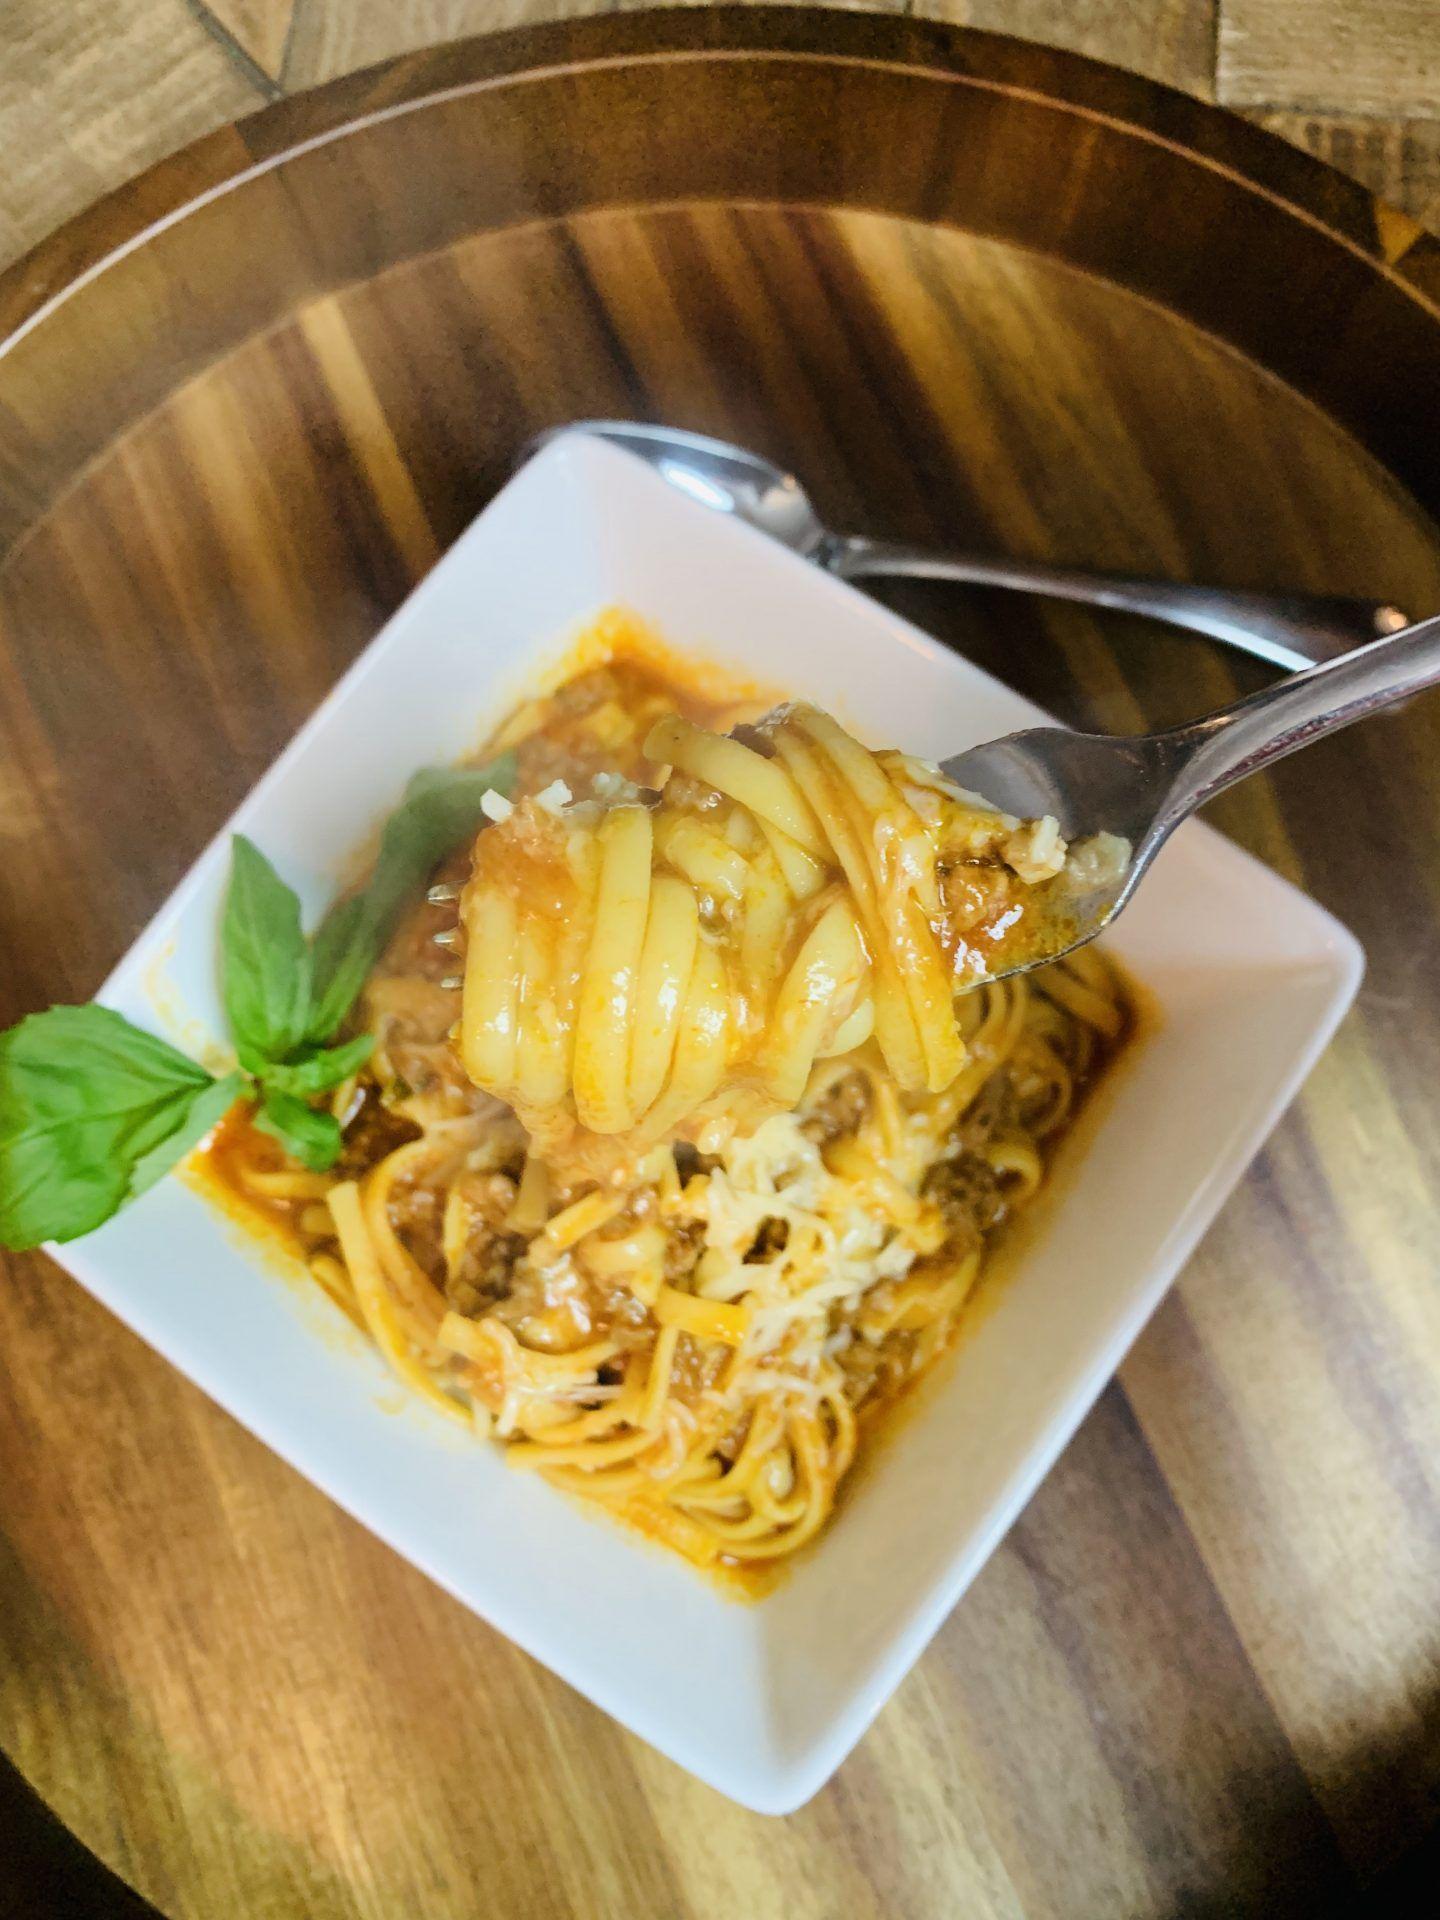 The Best Ninja Foodi Spaghetti - The Tasty Travelers